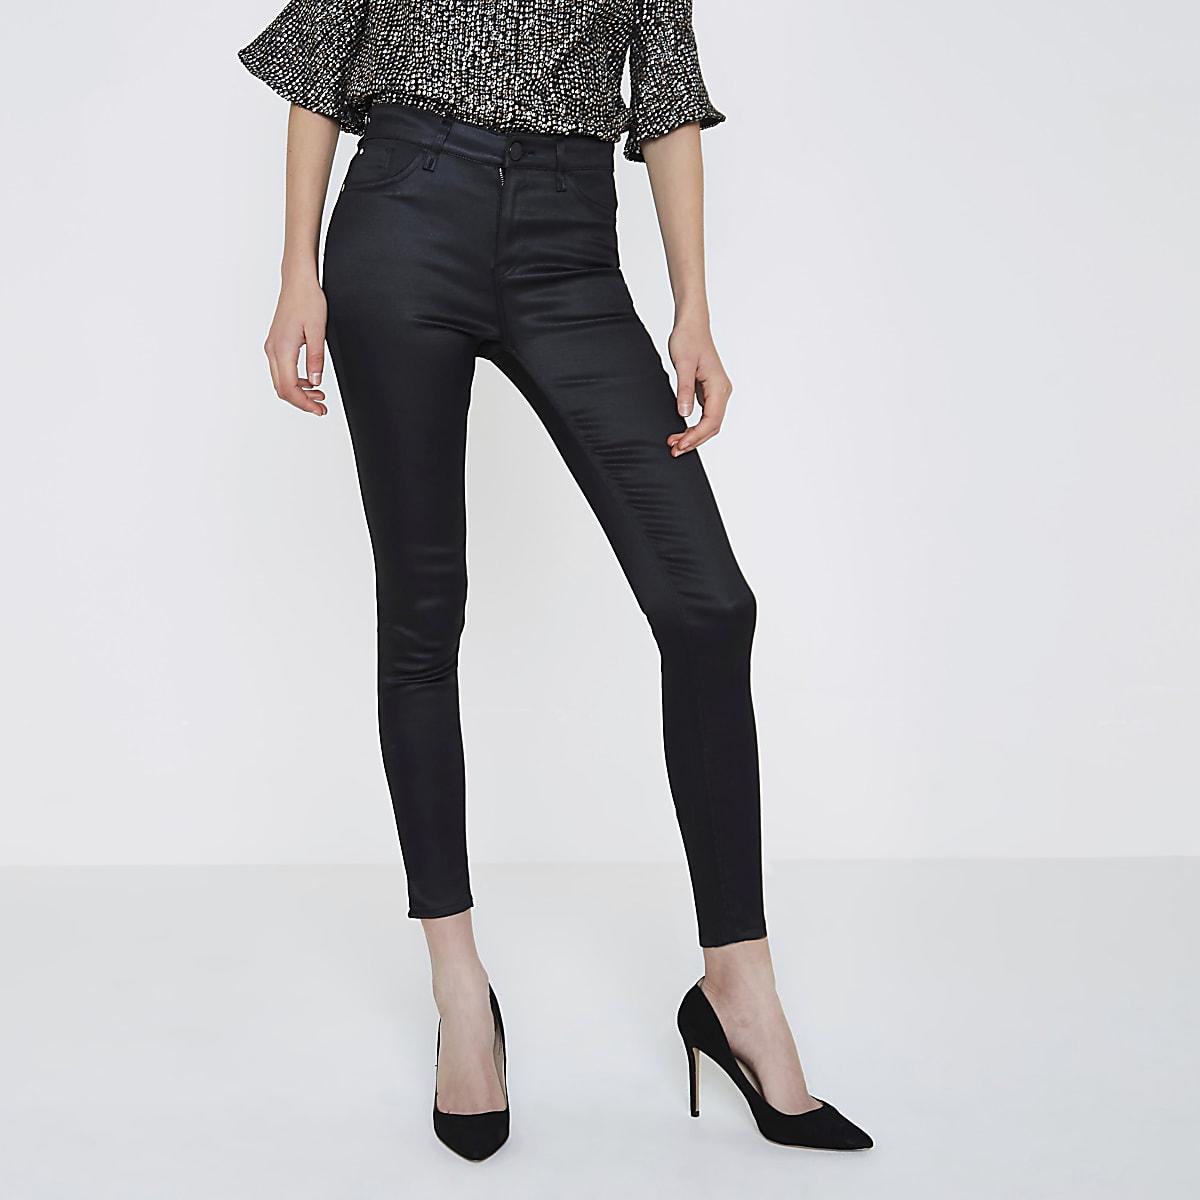 Amelie – Schwarze, beschichtete Superskinny Jeans